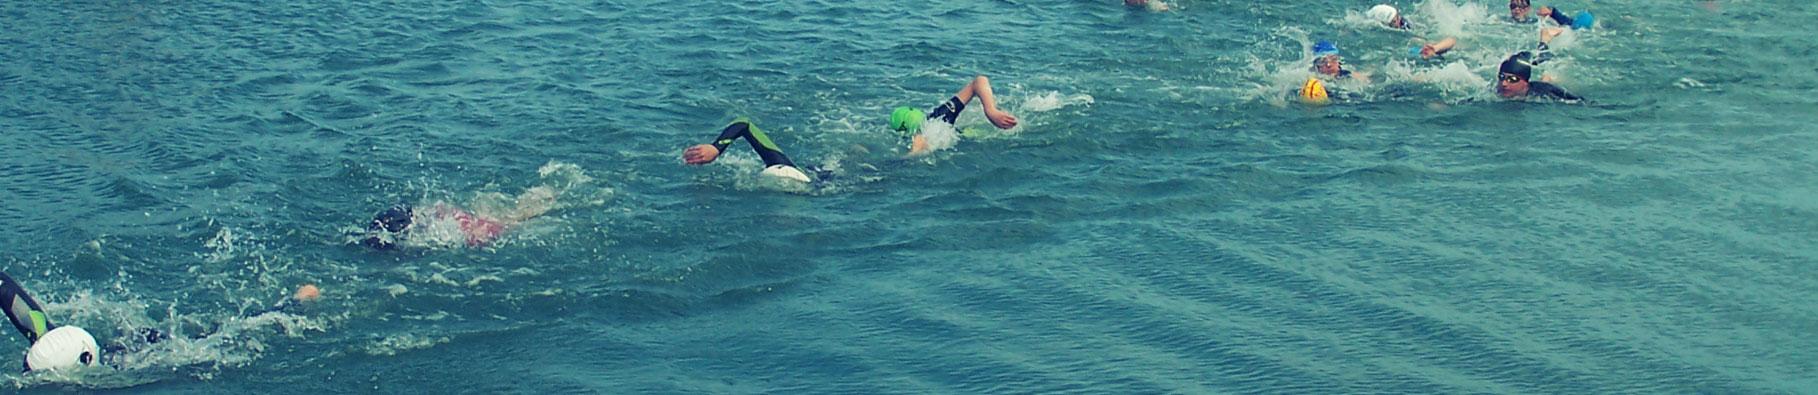 Junior triathlon event by Shoreline in Bude, Cornwall